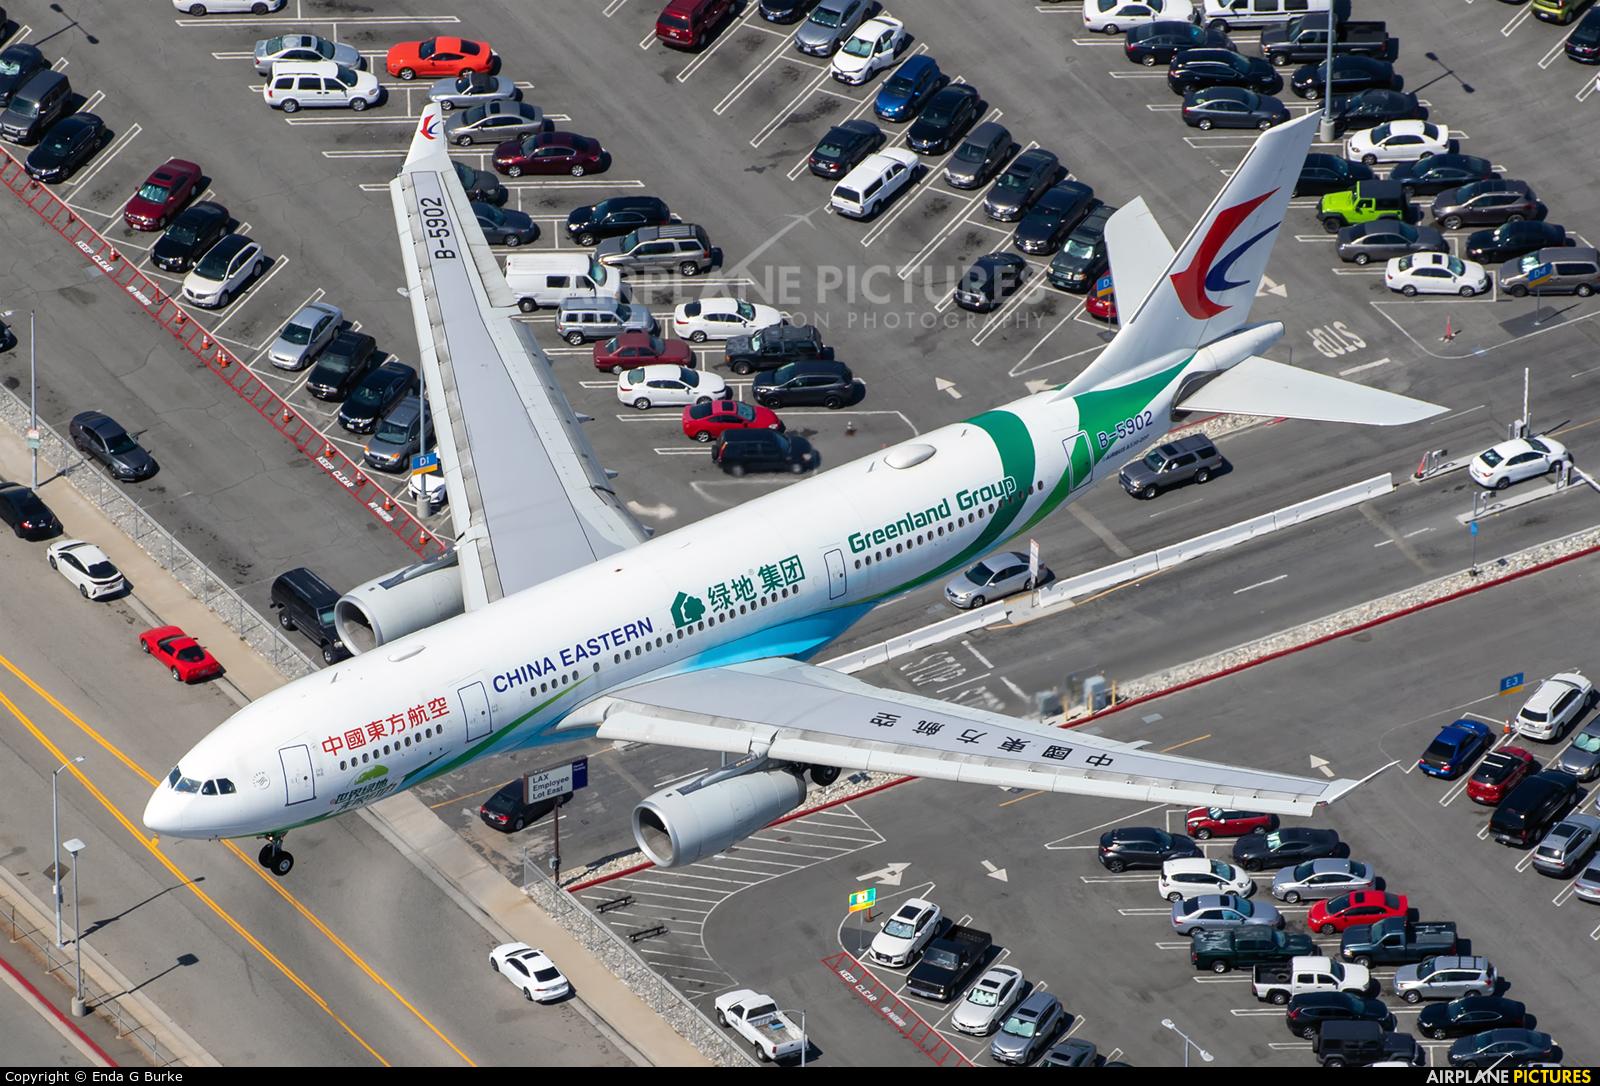 China Eastern Airlines B-5902 aircraft at Los Angeles Intl